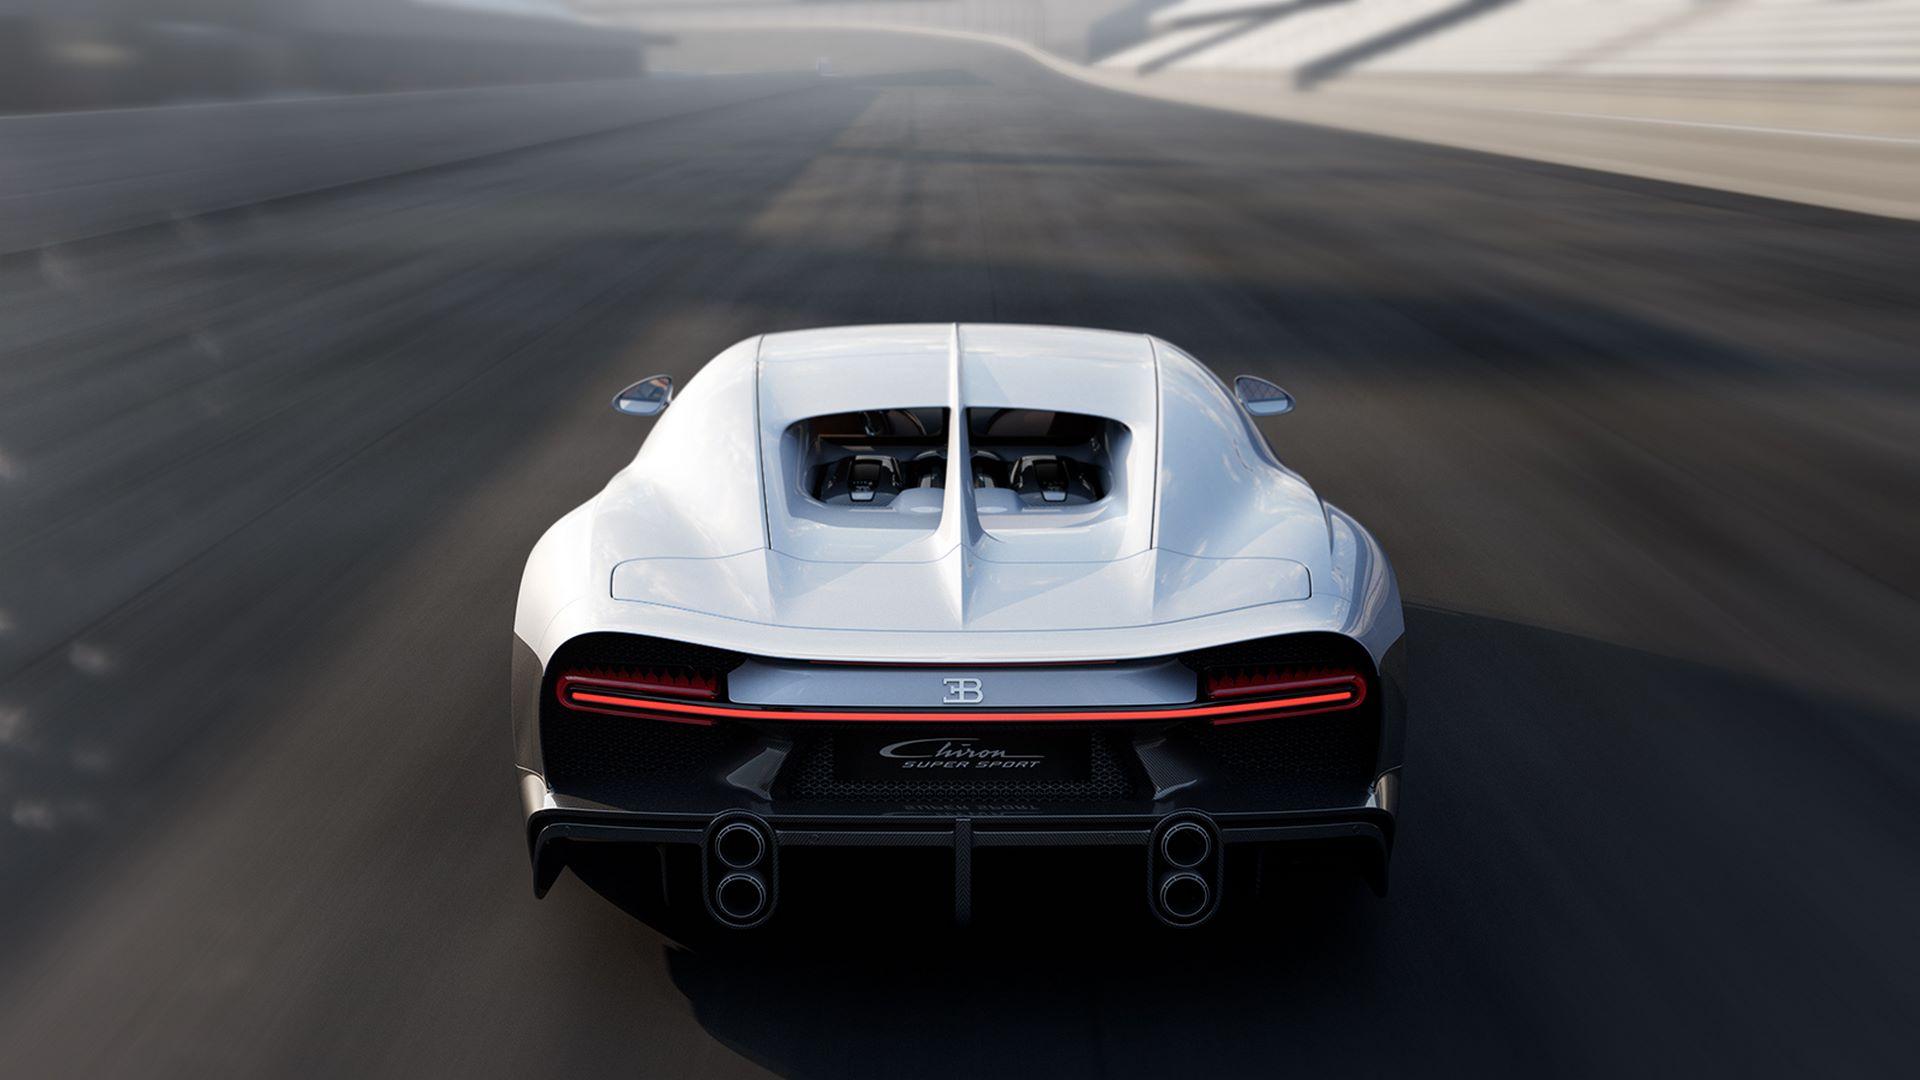 02_09_bugatti_chiron_super_sport_high_speed_rear